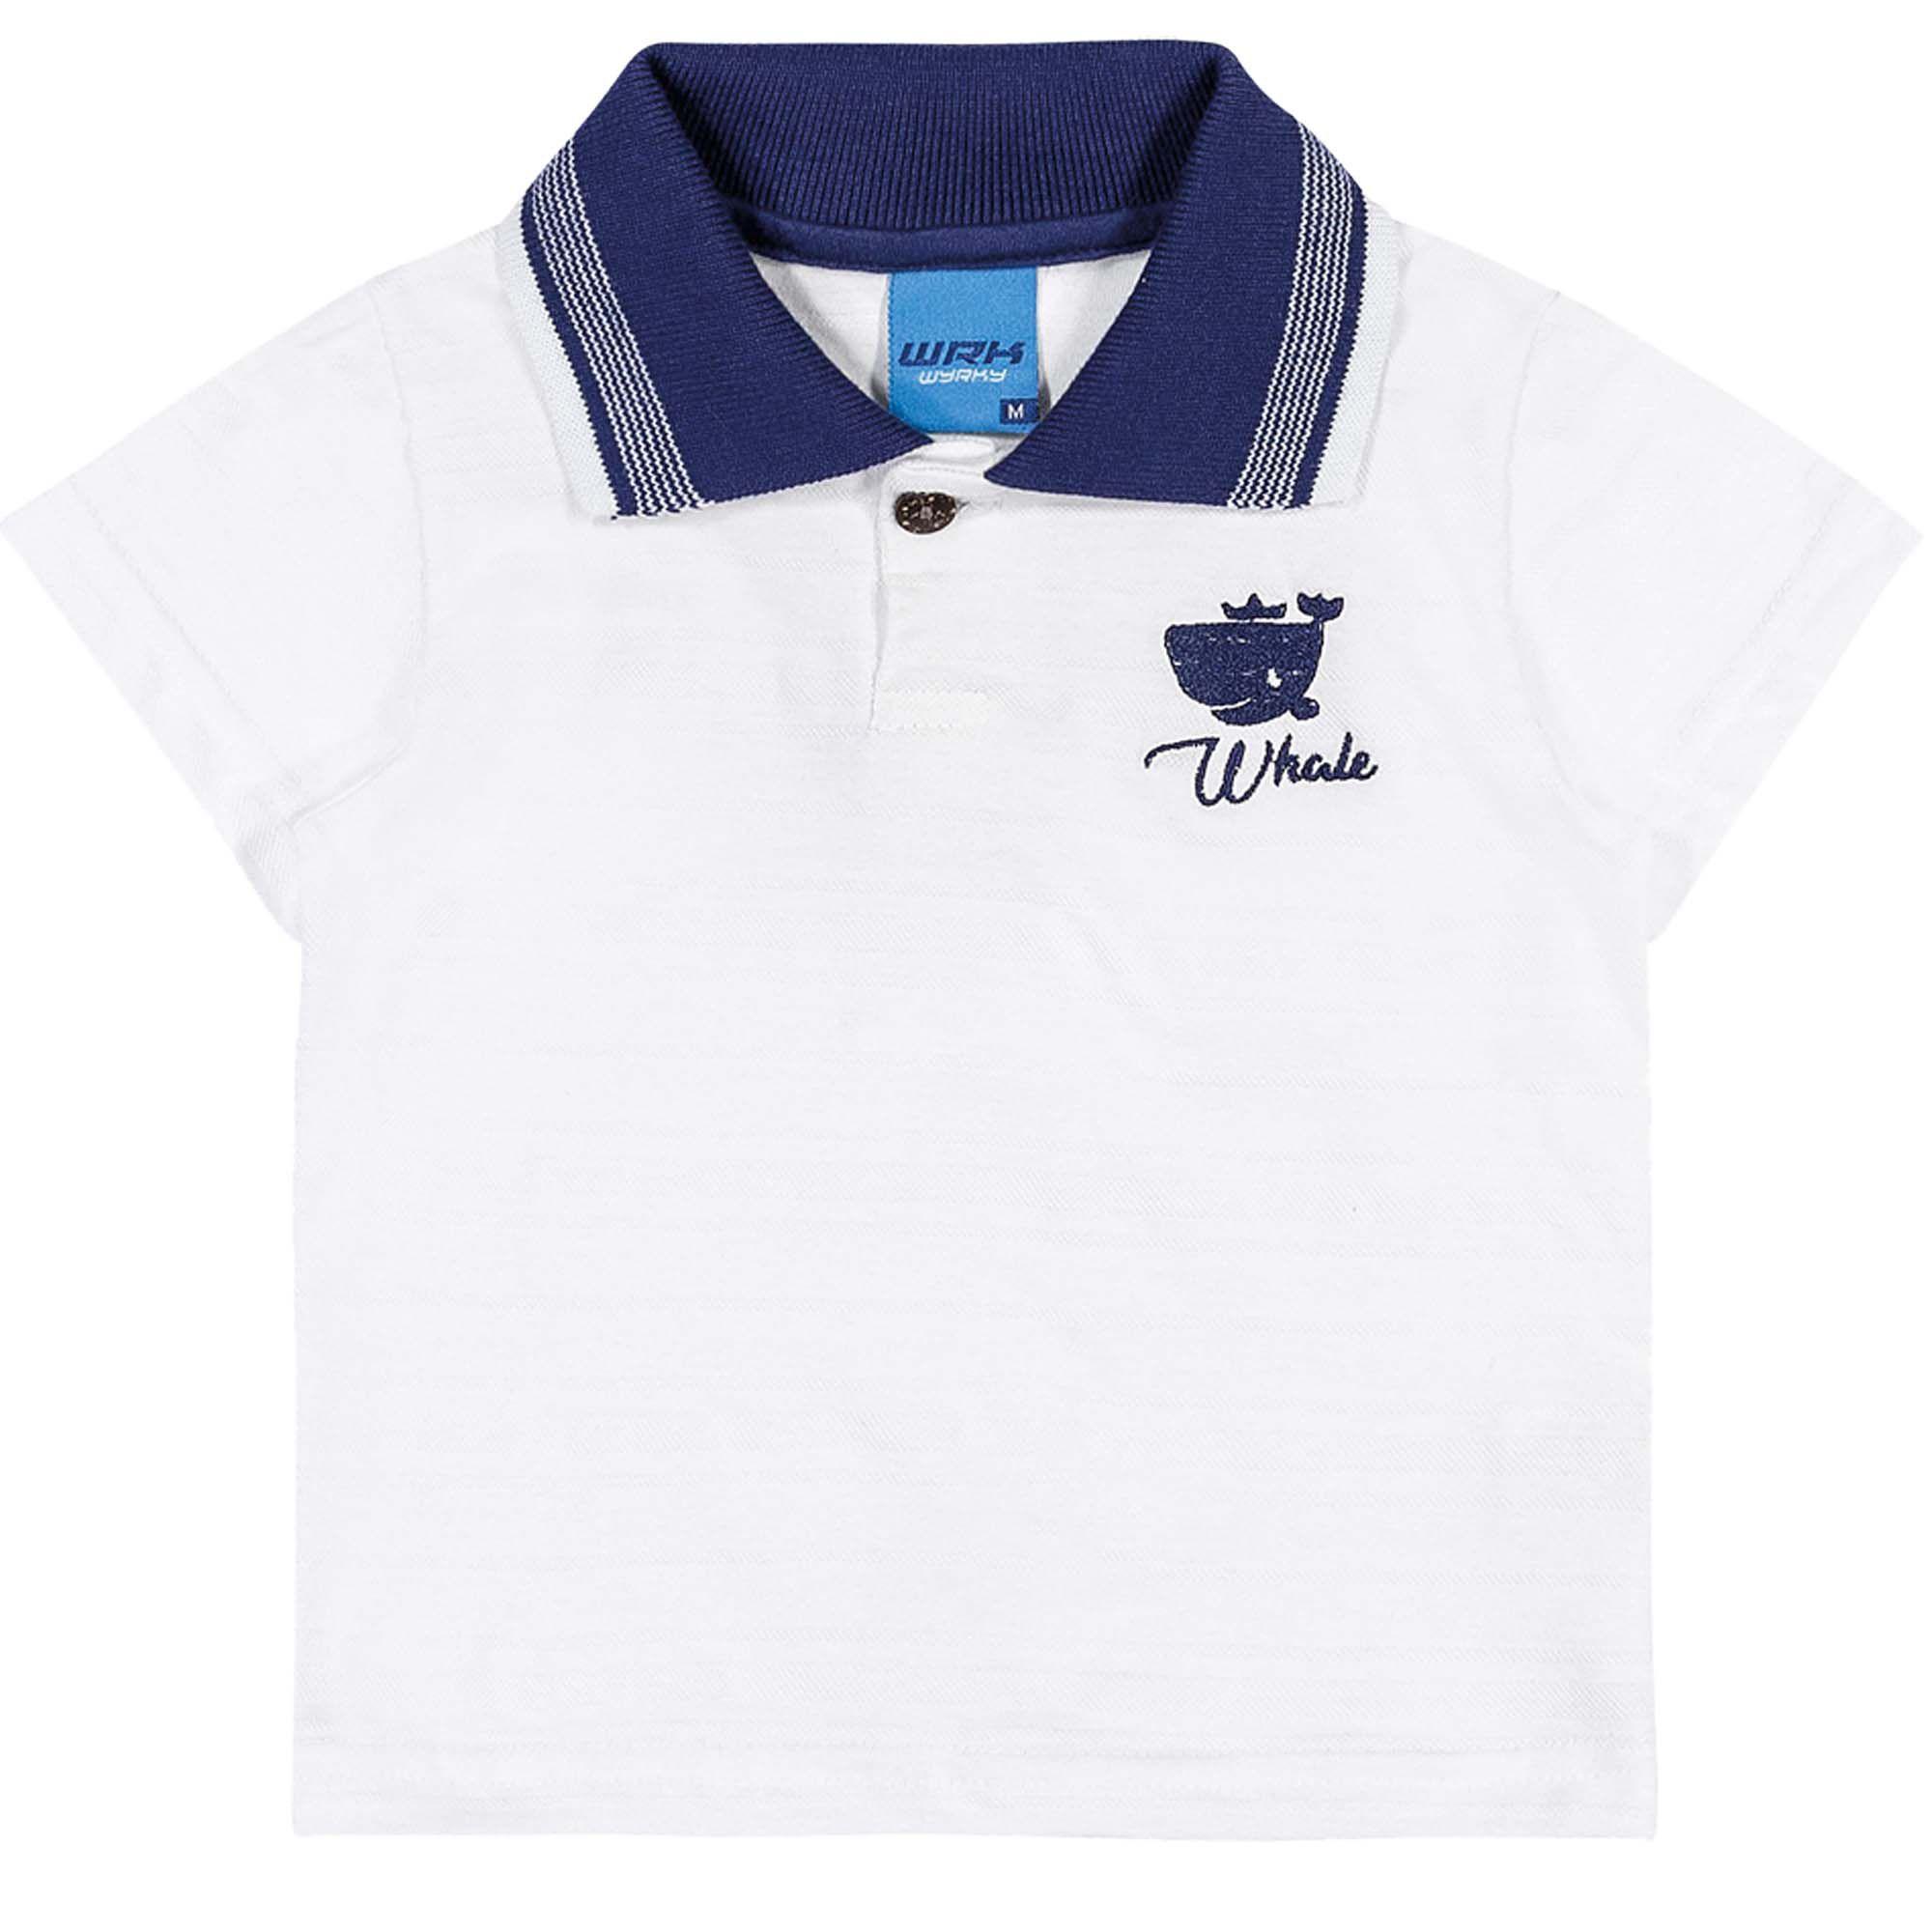 Camiseta Polo Meia Manga Romitex Wyrky Baleia - P ao G